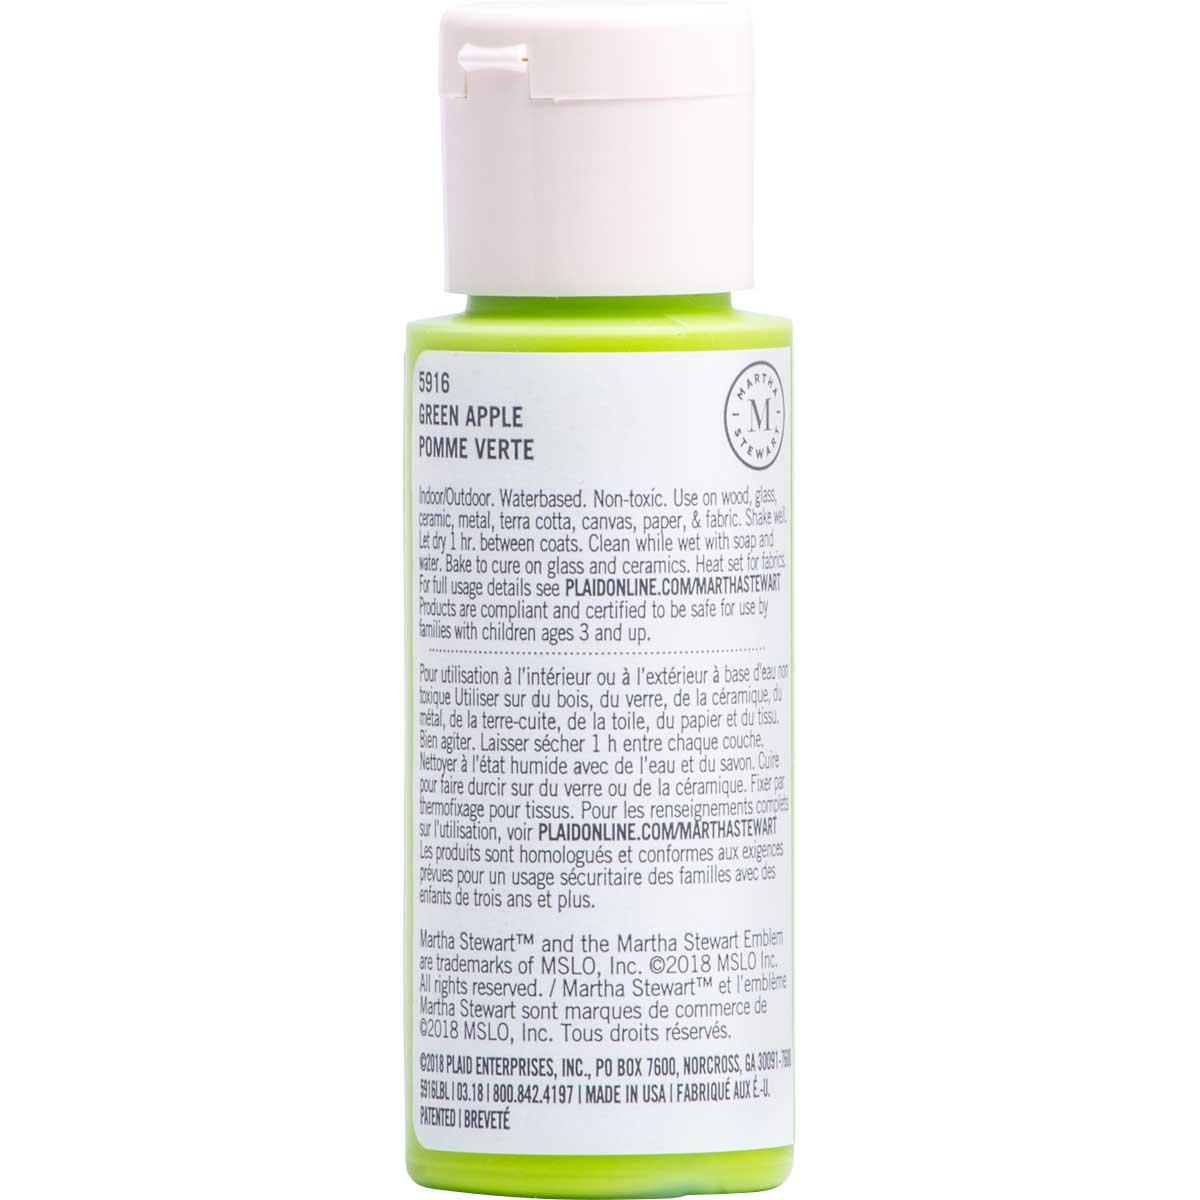 Martha Stewart ® Multi-Surface Satin Acrylic Craft Paint CPSIA - Green Apple, 2 oz. - 5916